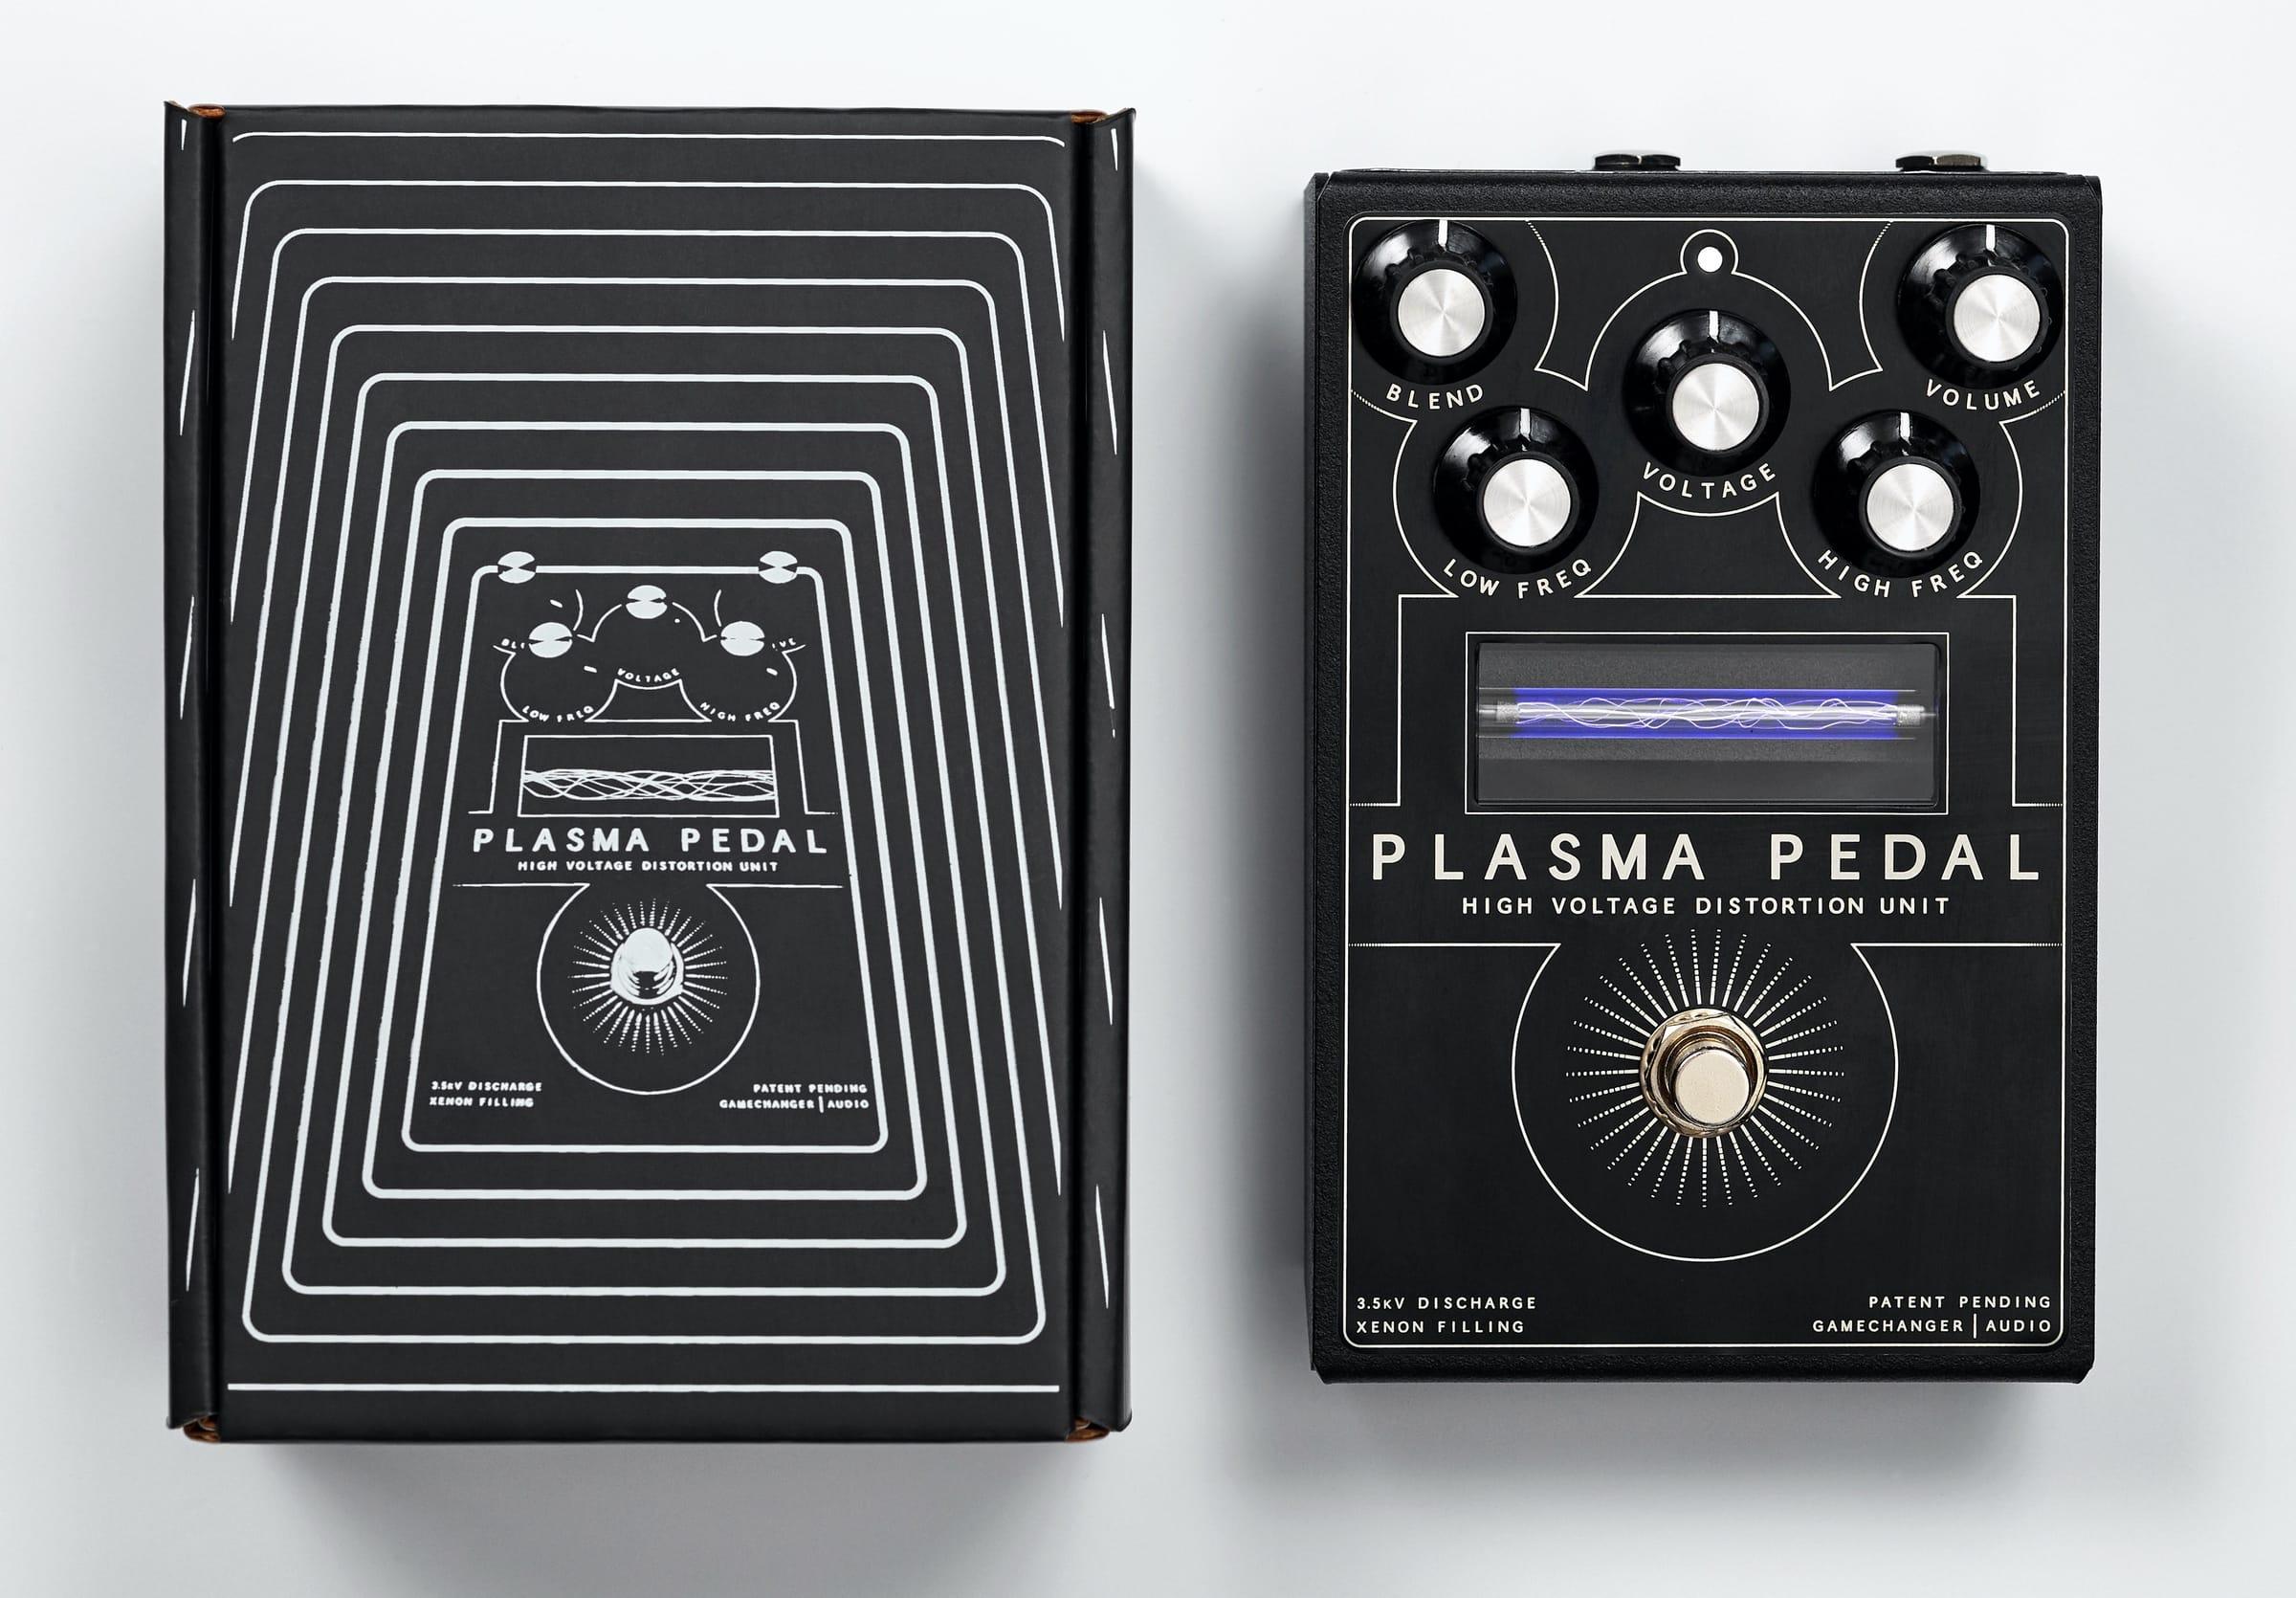 Gamechanger-Audio-Plasma-Pedal-5